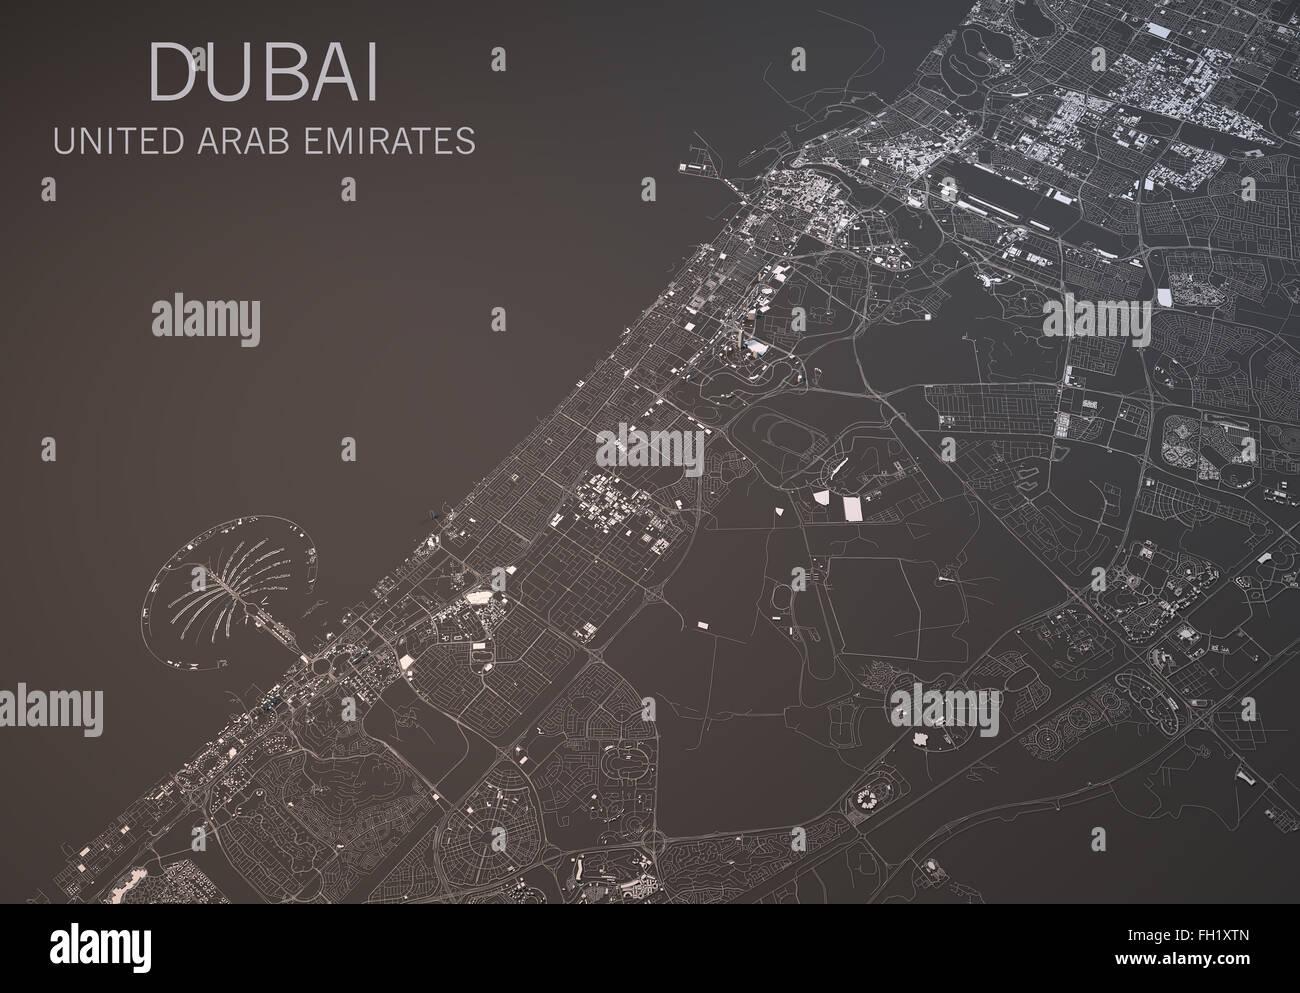 как море, фото карта араб спутник самое